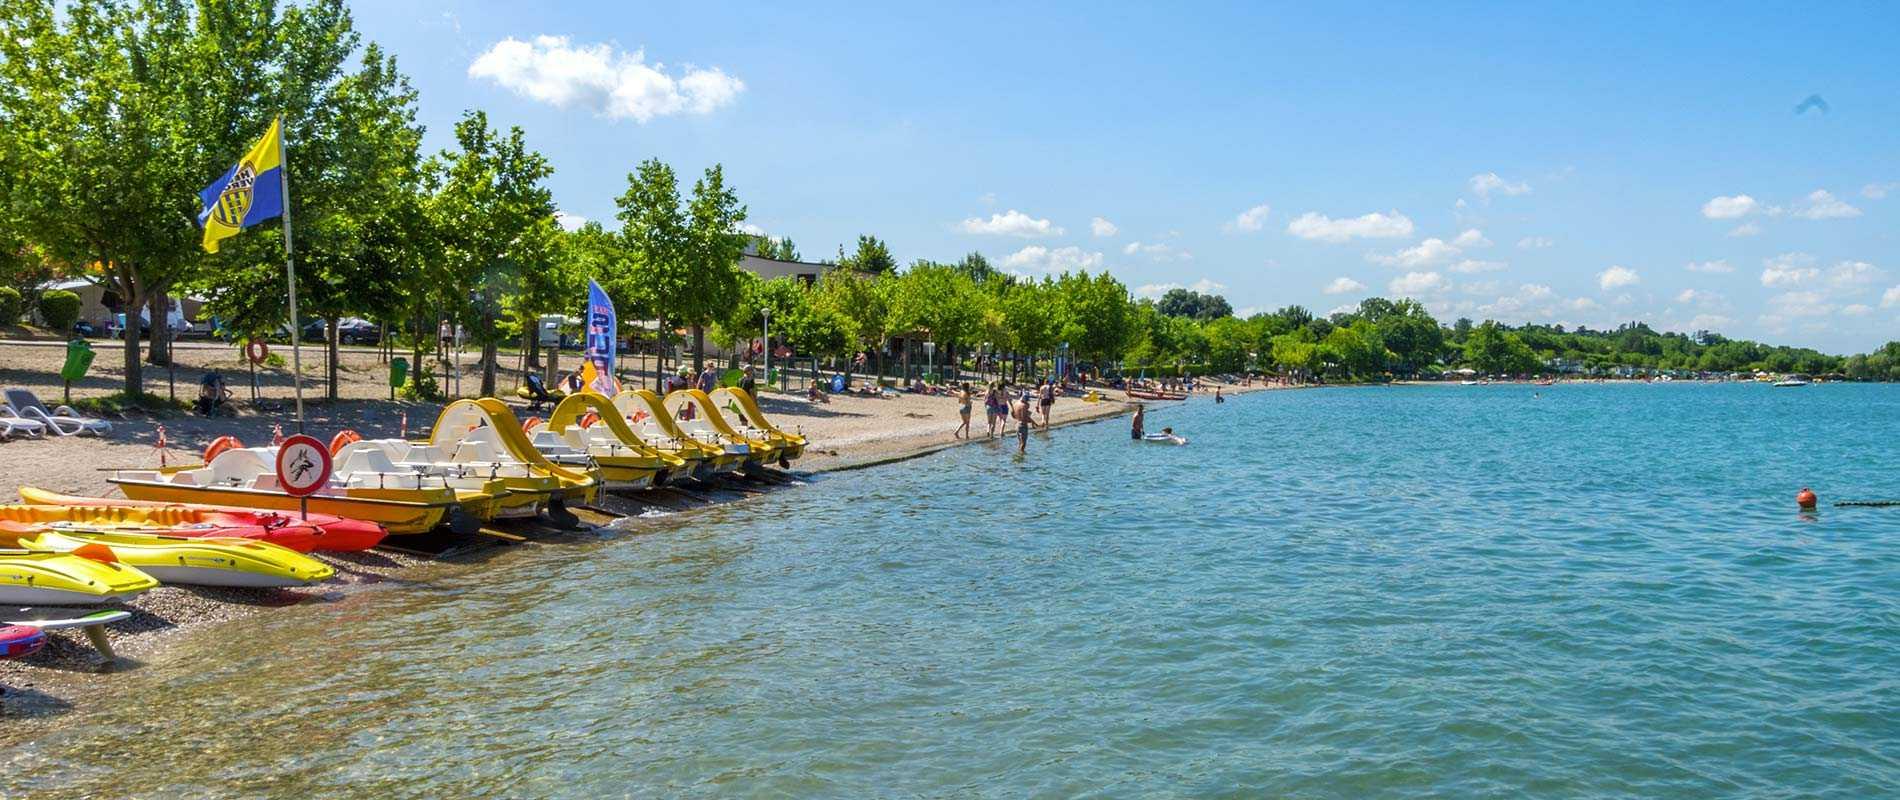 Campingplatz Gardasee   Spiaggia d'Oro Camping Lazise   Urlaub am ...